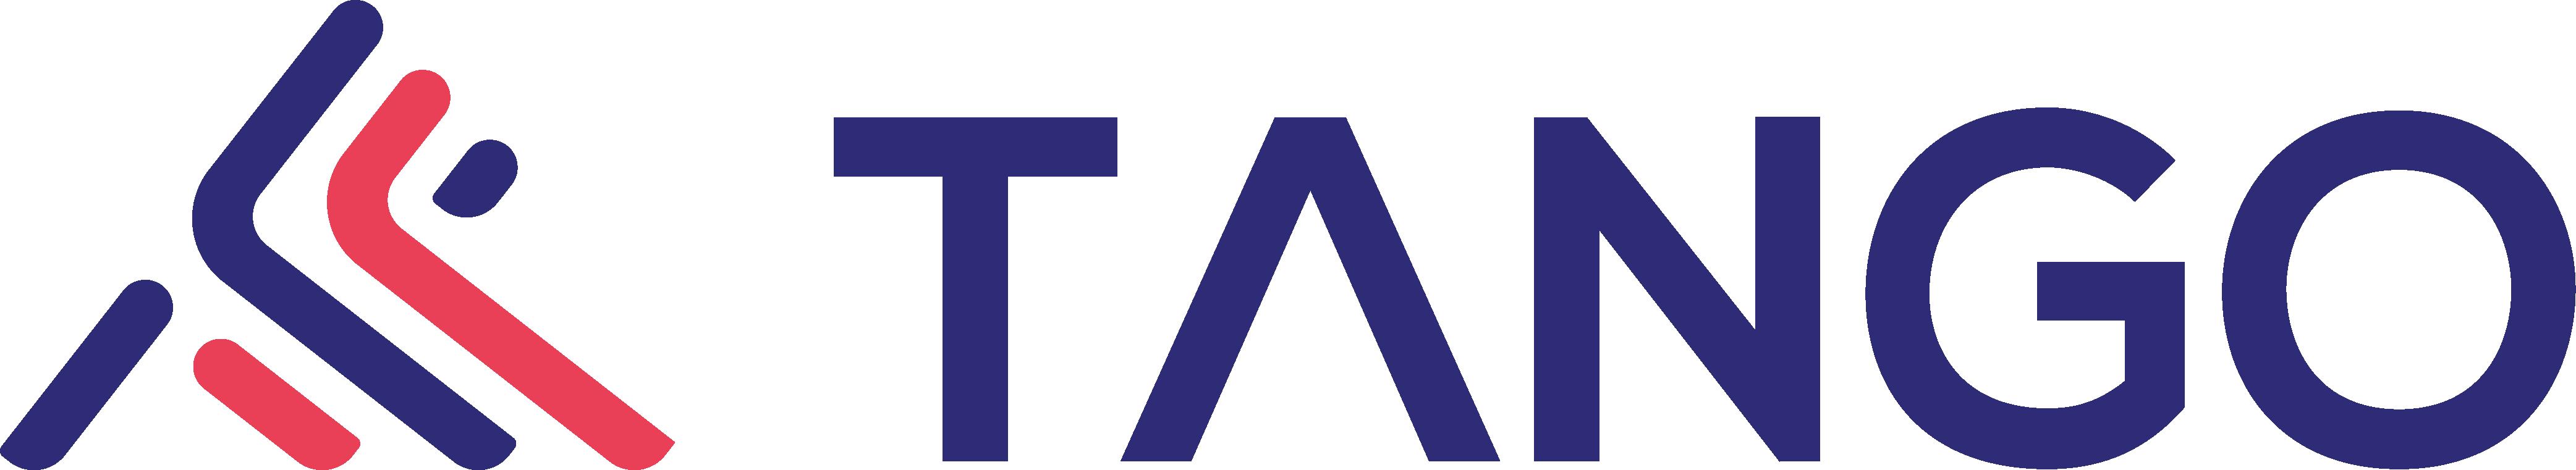 Tango logo